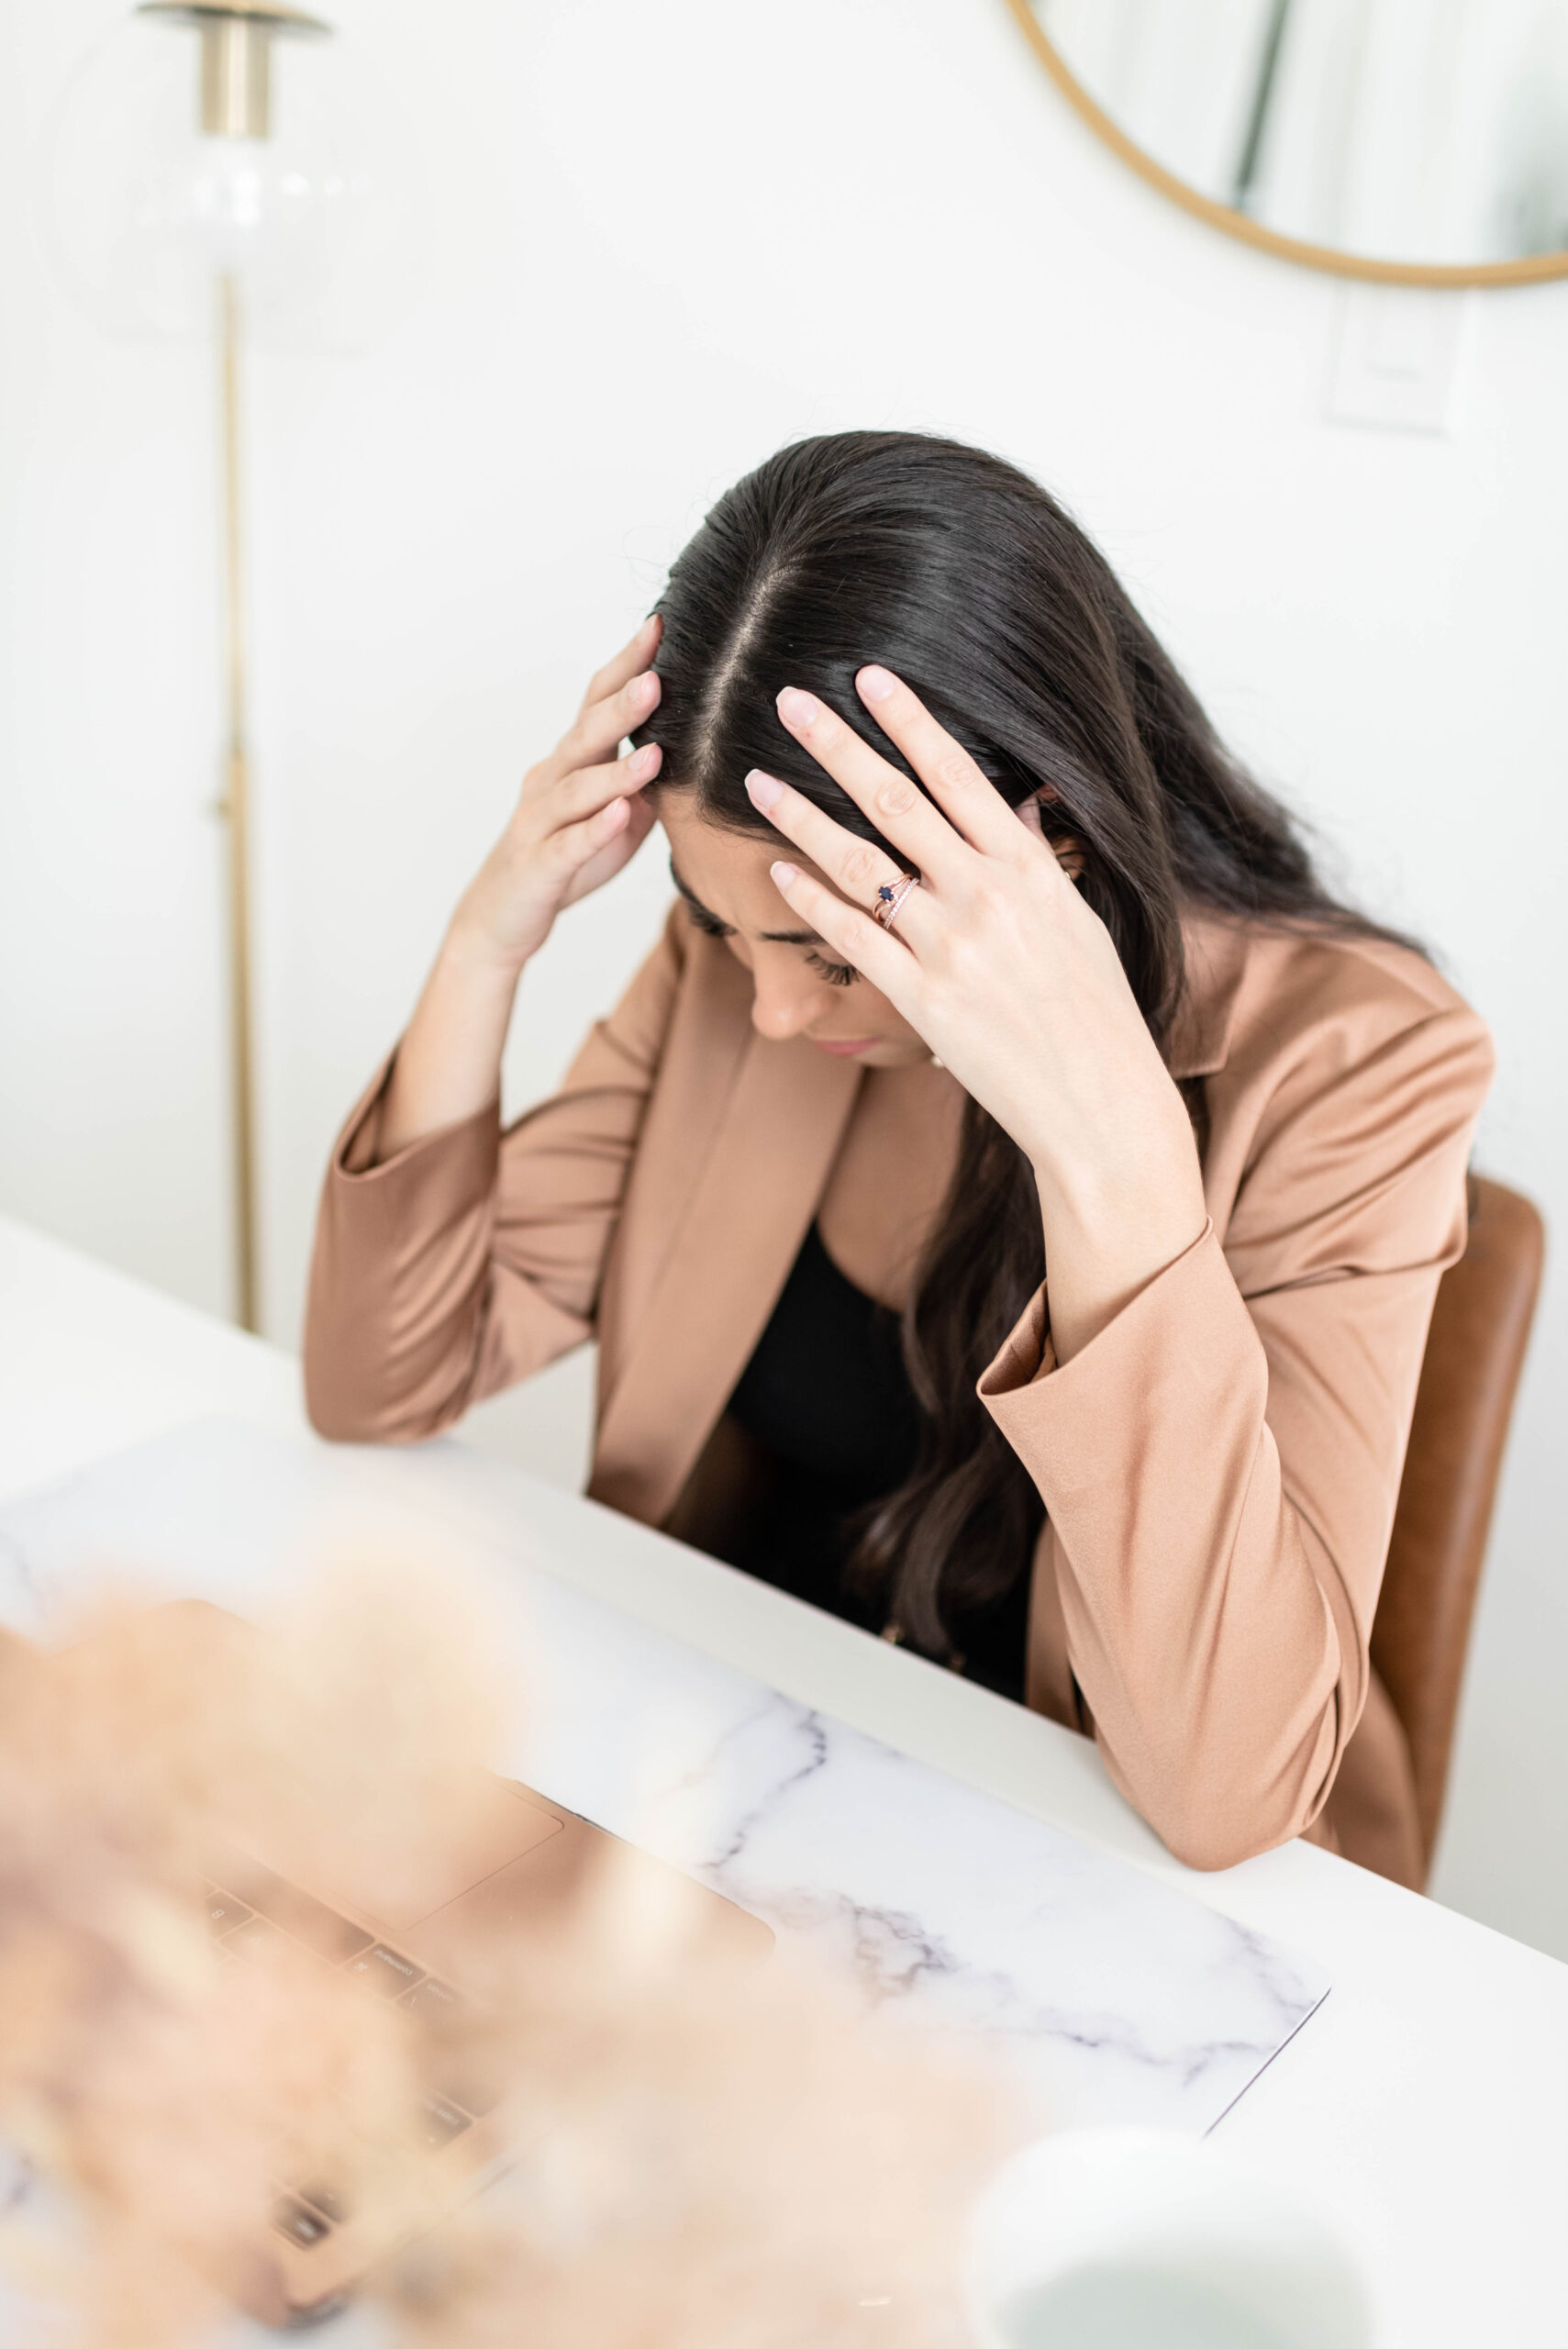 11 Insightful Ways to Overcome Feeling Inadequate